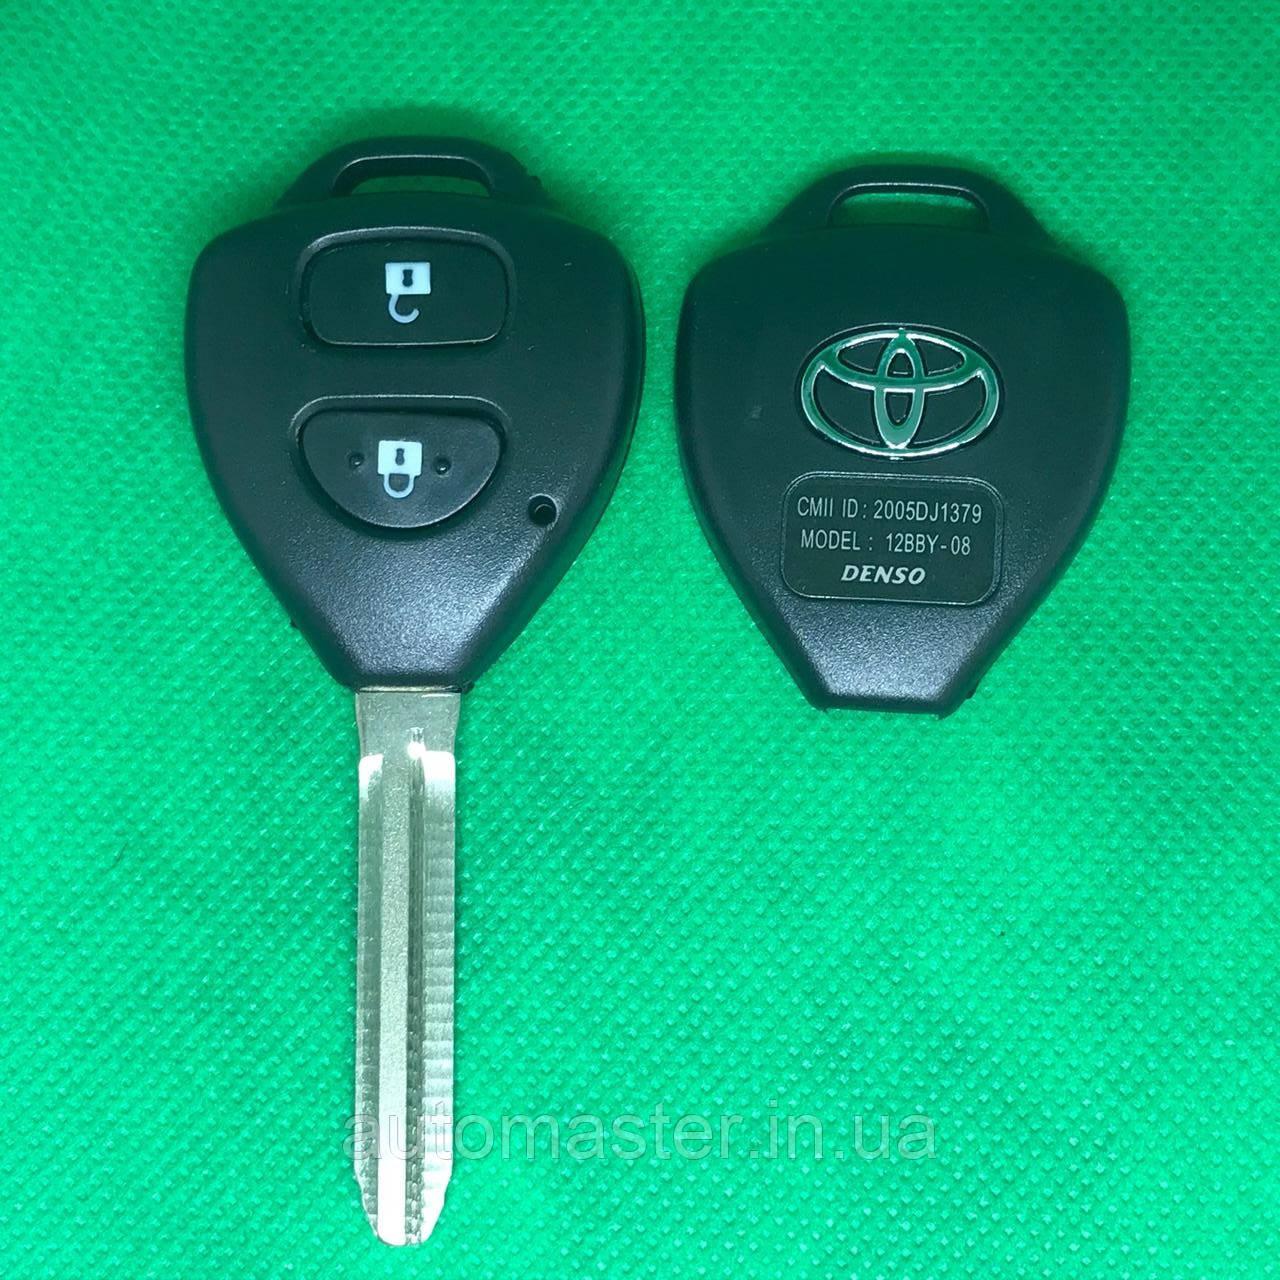 Автоключ для Toyota (Тойота) Camry, Corolla 2 - кнопки, лезвие TOY 43, 433 Mhz , 4D67 chip, HYQ12BBY